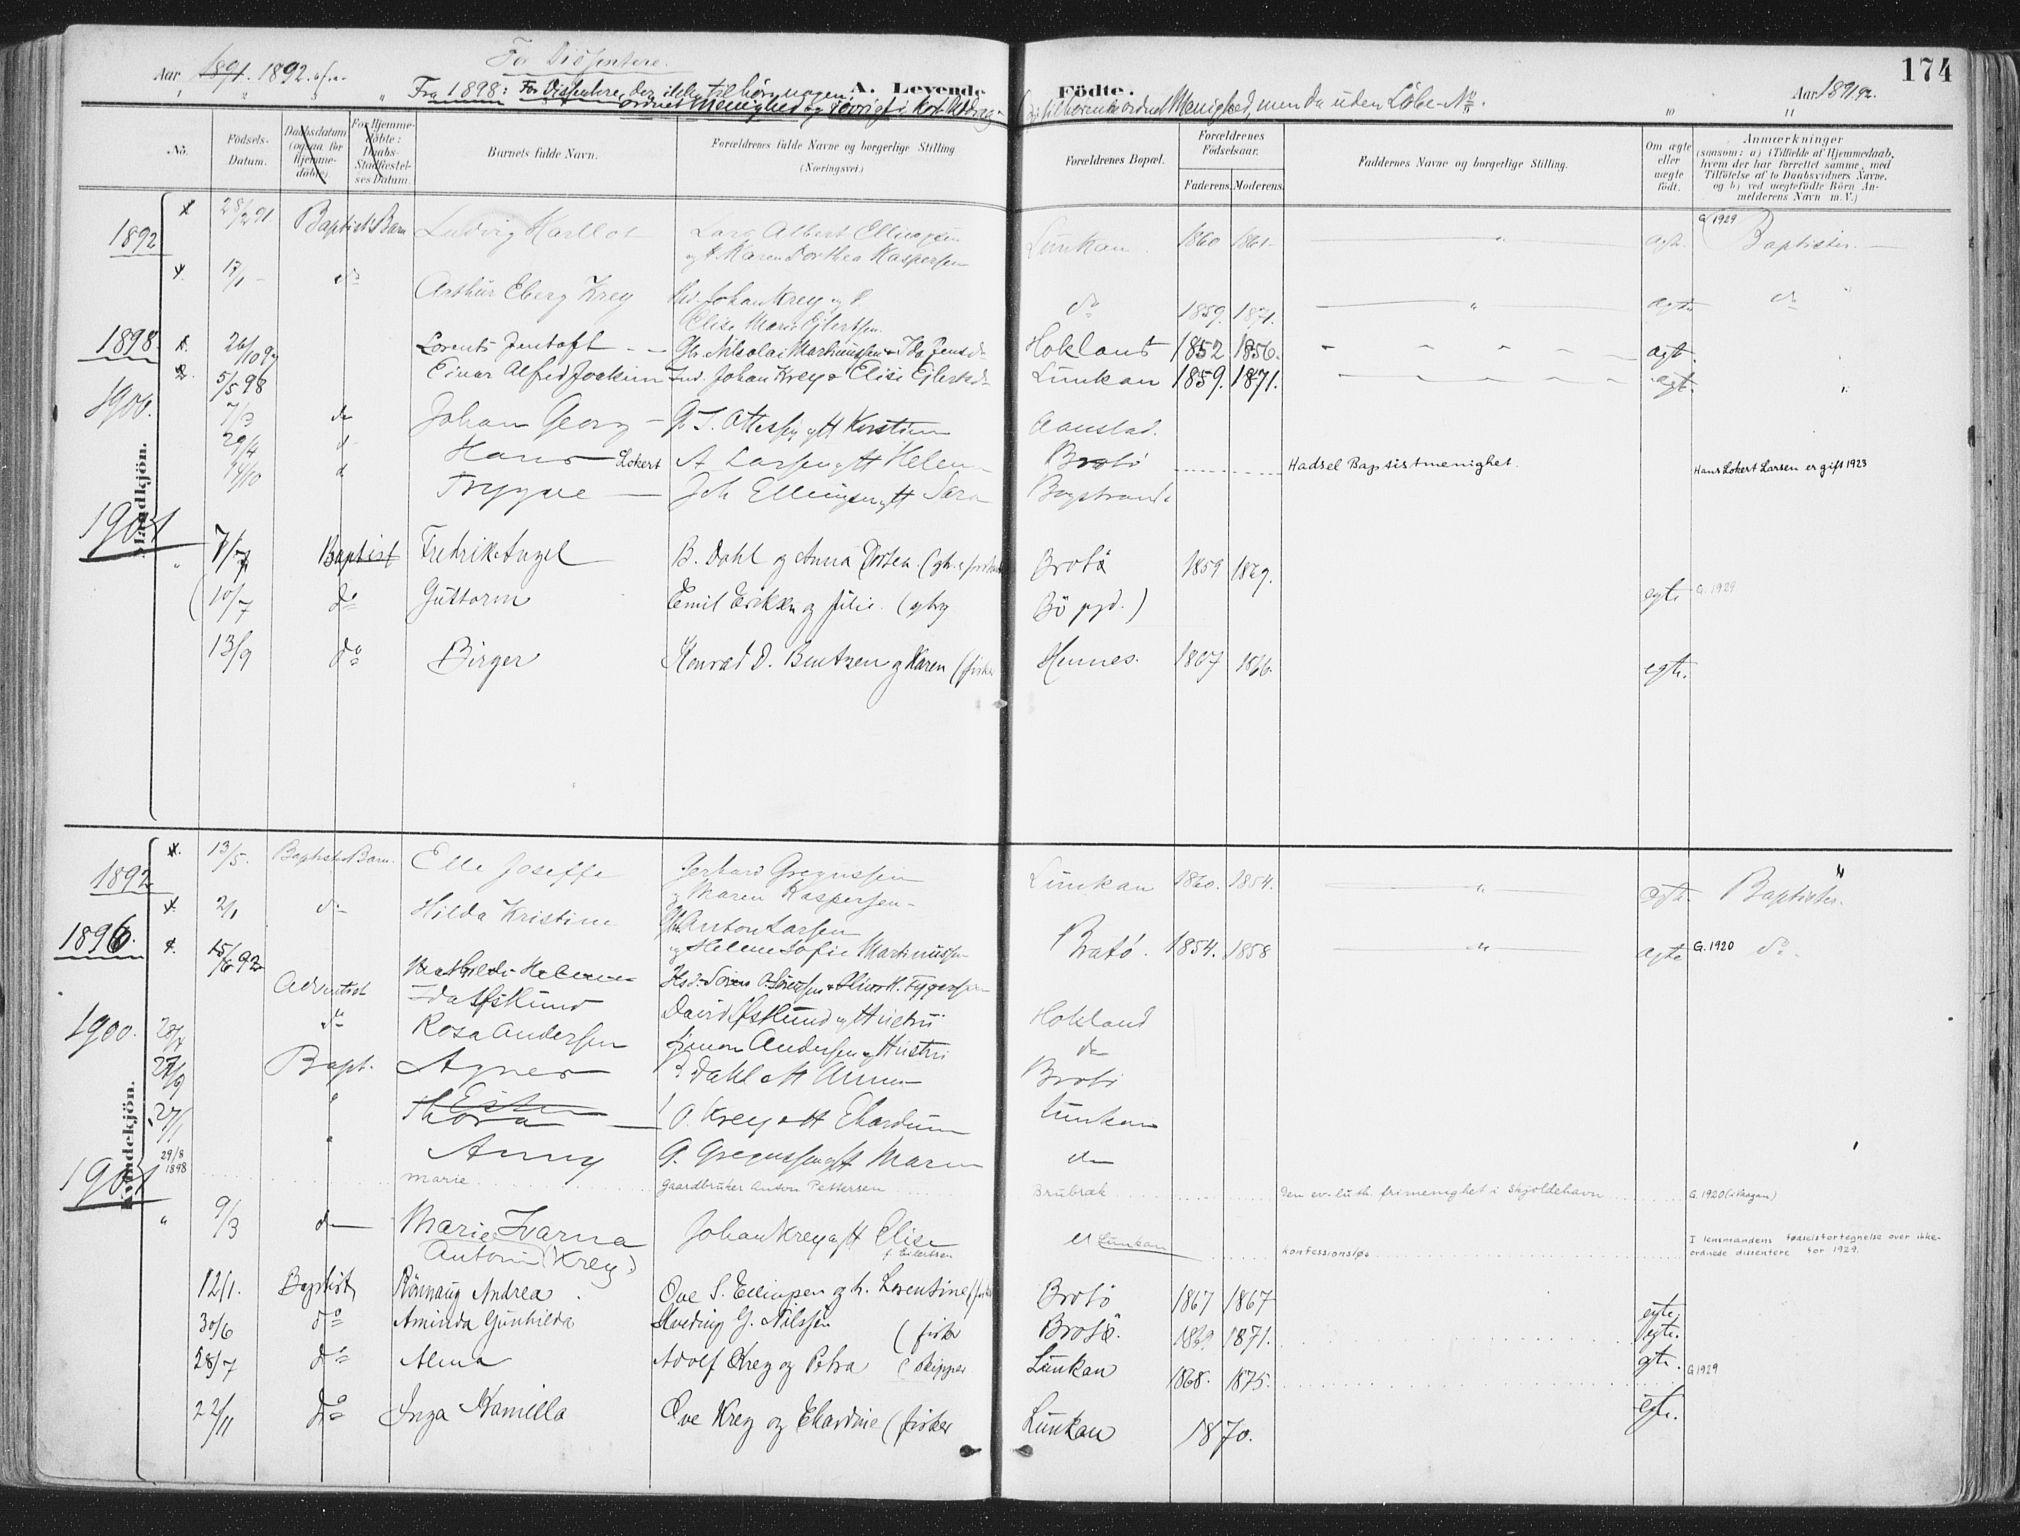 SAT, Ministerialprotokoller, klokkerbøker og fødselsregistre - Nordland, 888/L1246: Ministerialbok nr. 888A12, 1891-1903, s. 174